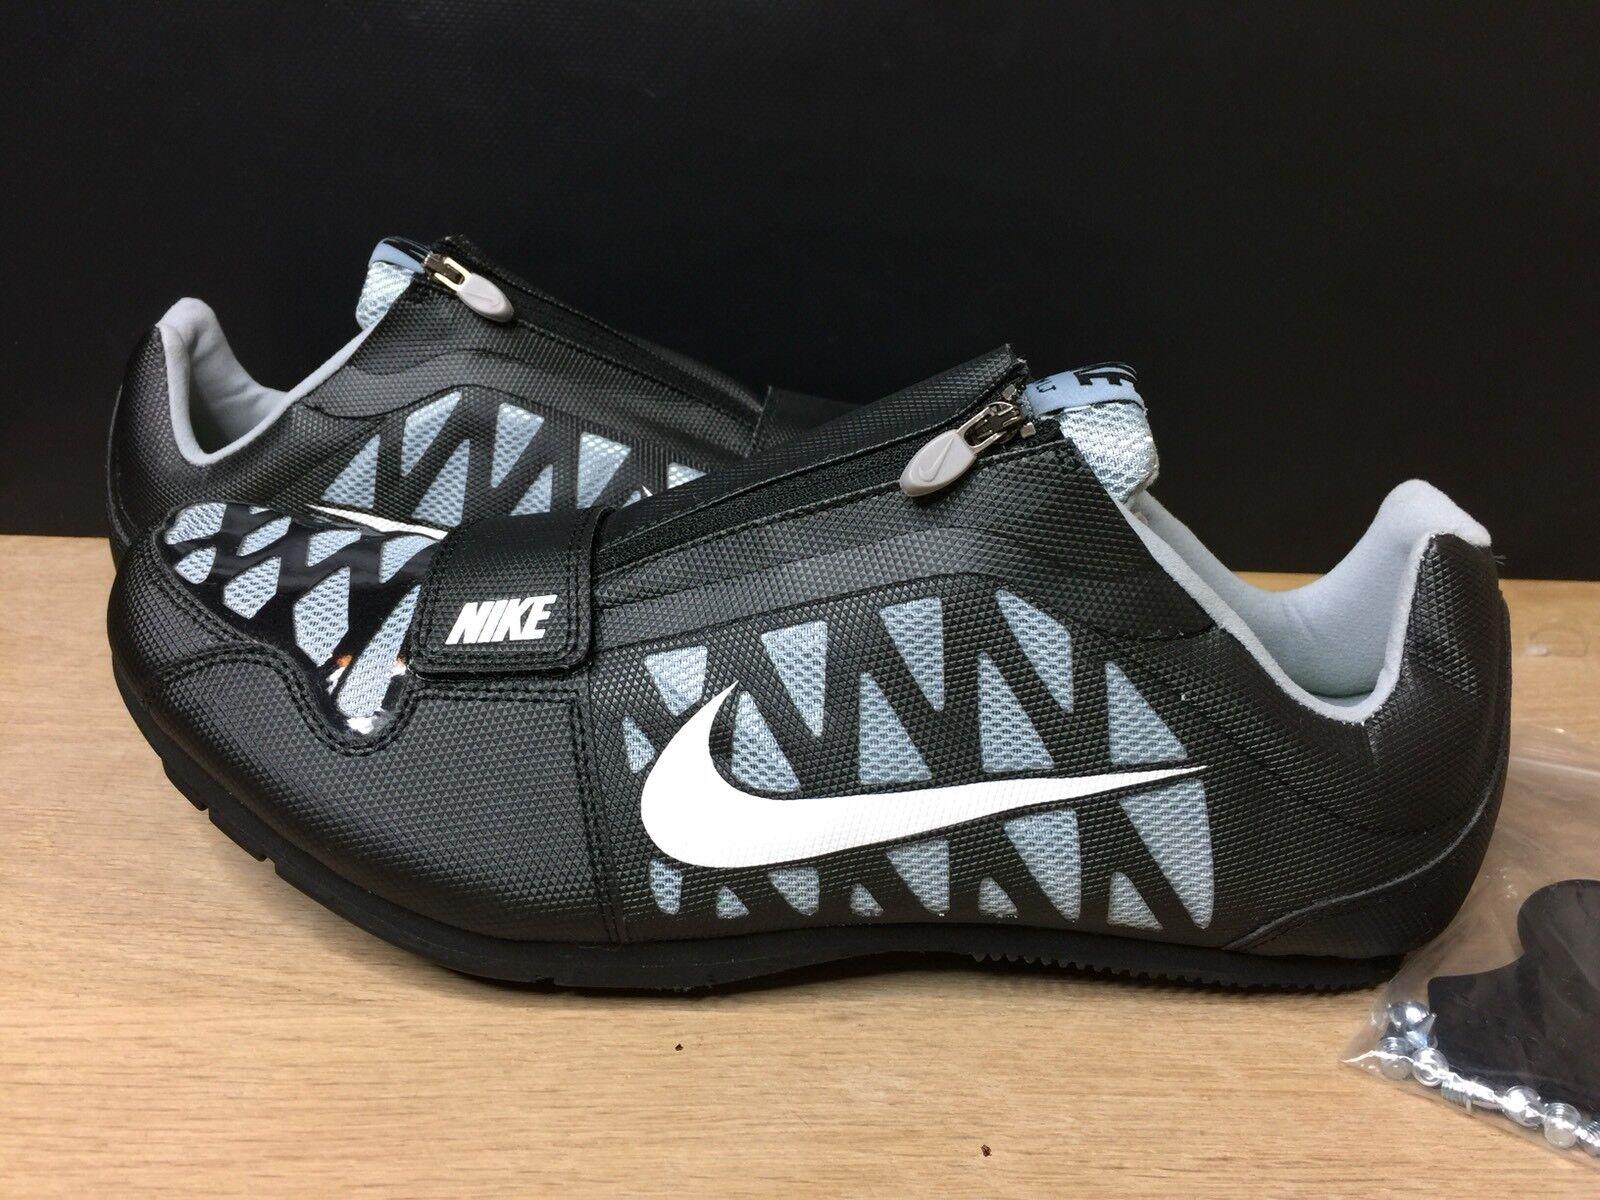 Nike zoom lj 4 iv di salto in lungo, nero, grigio 415339-002 Uomo grandi spuntoni